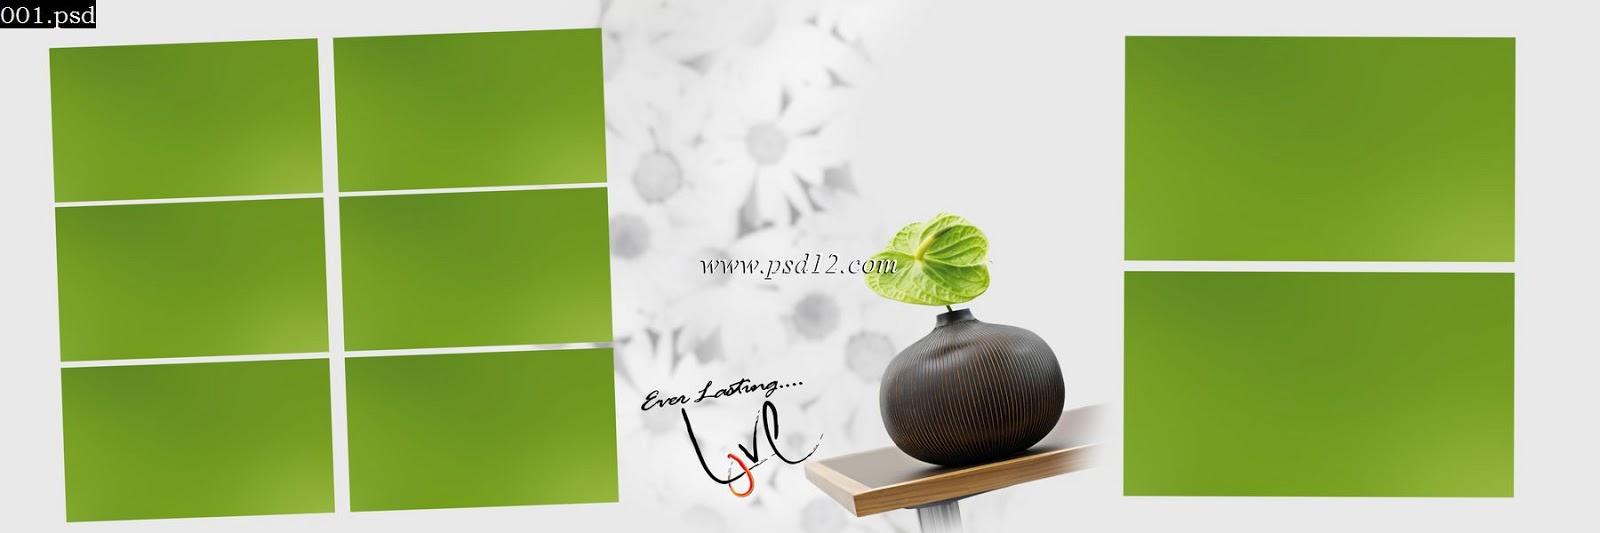 Free download karizma canvera album design in telugu psd files.